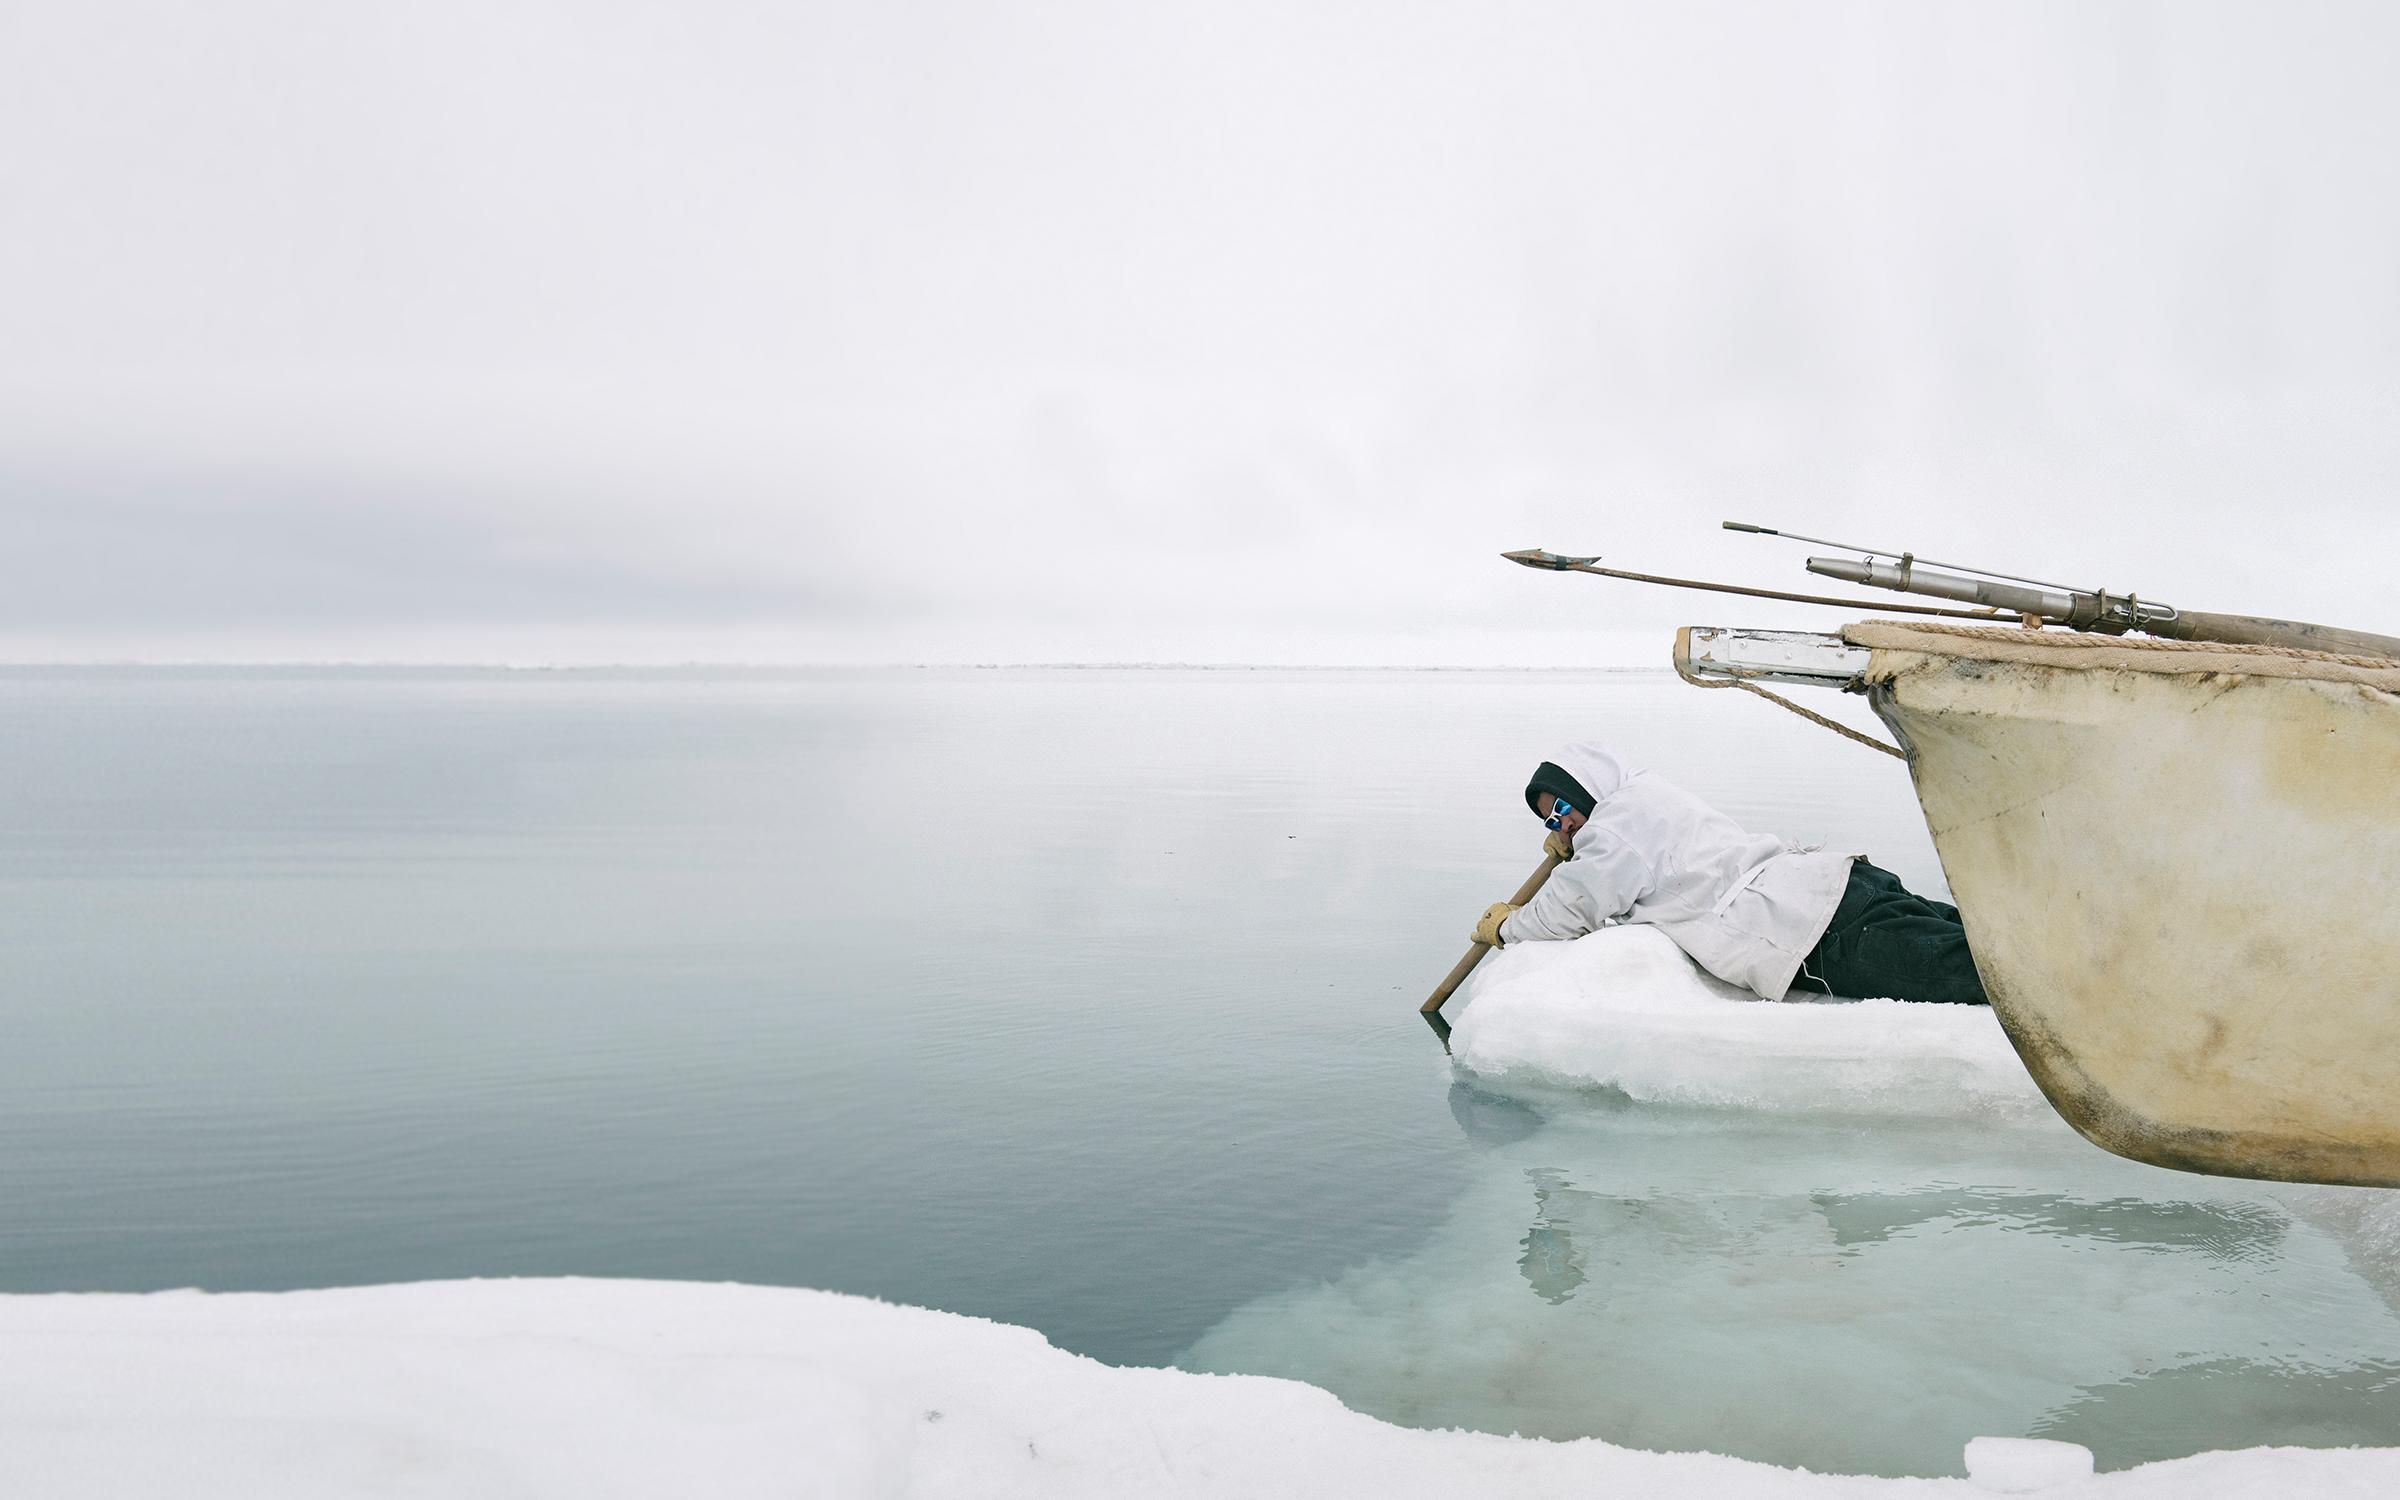 Fisherman on ice near water